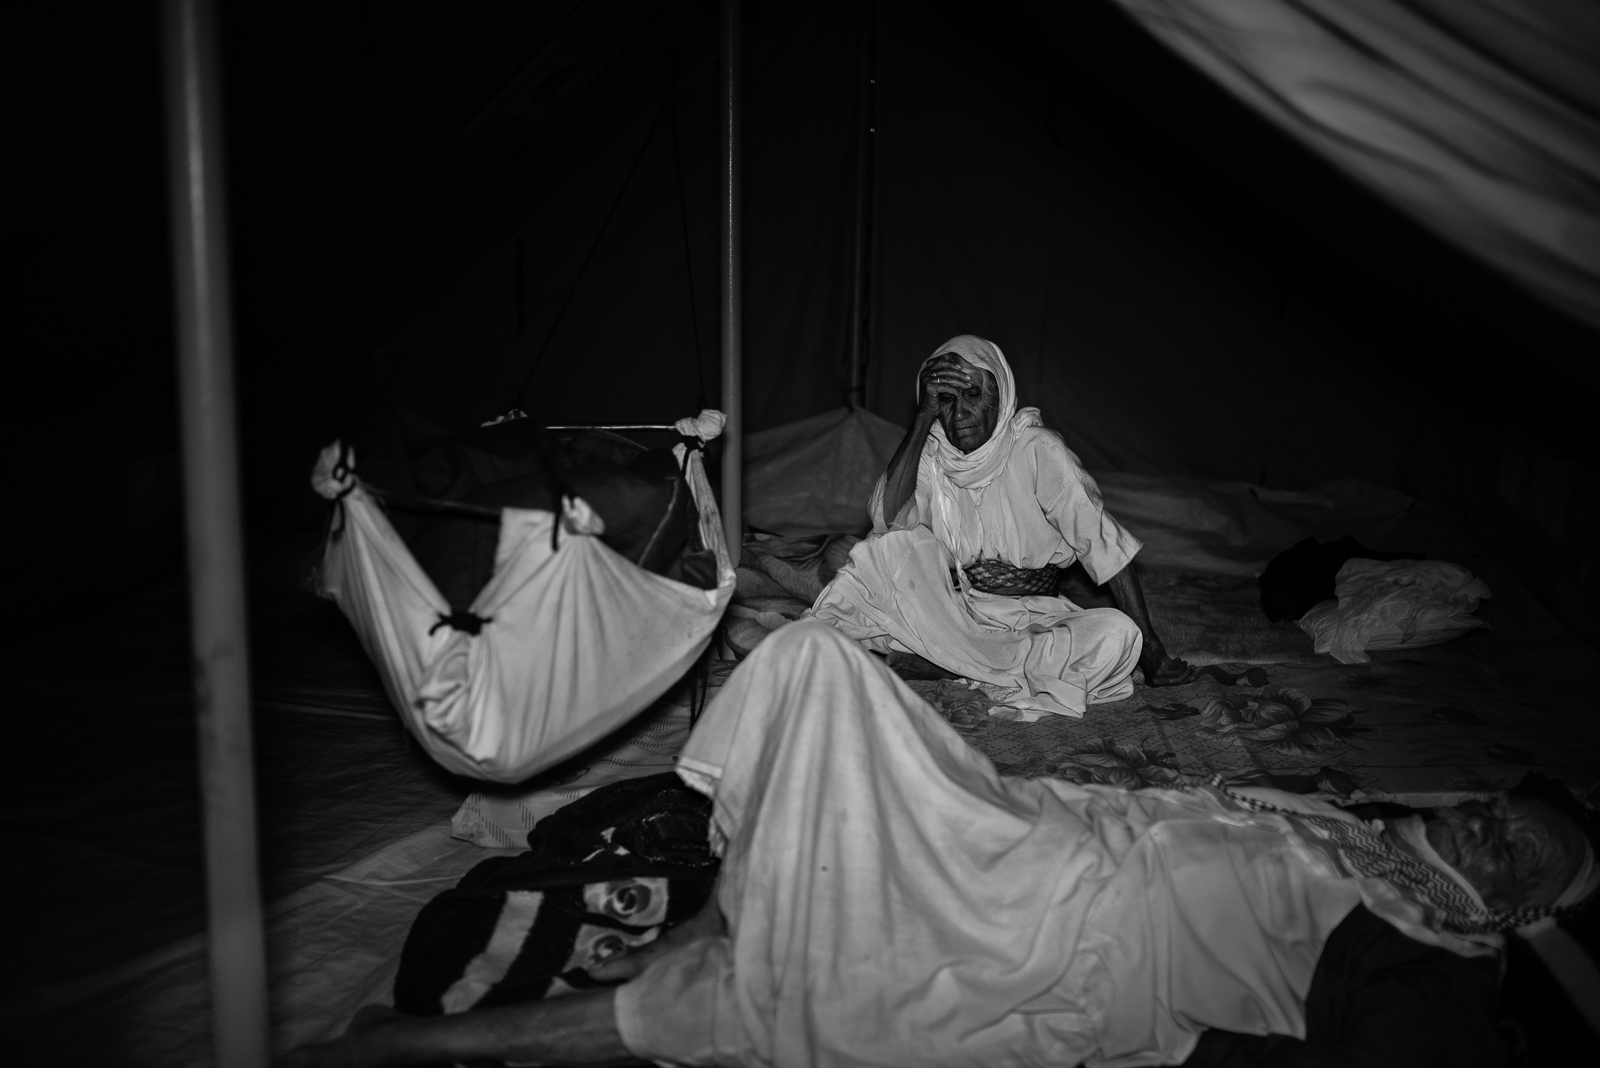 Life inside a tend, Zakho's refugees camp